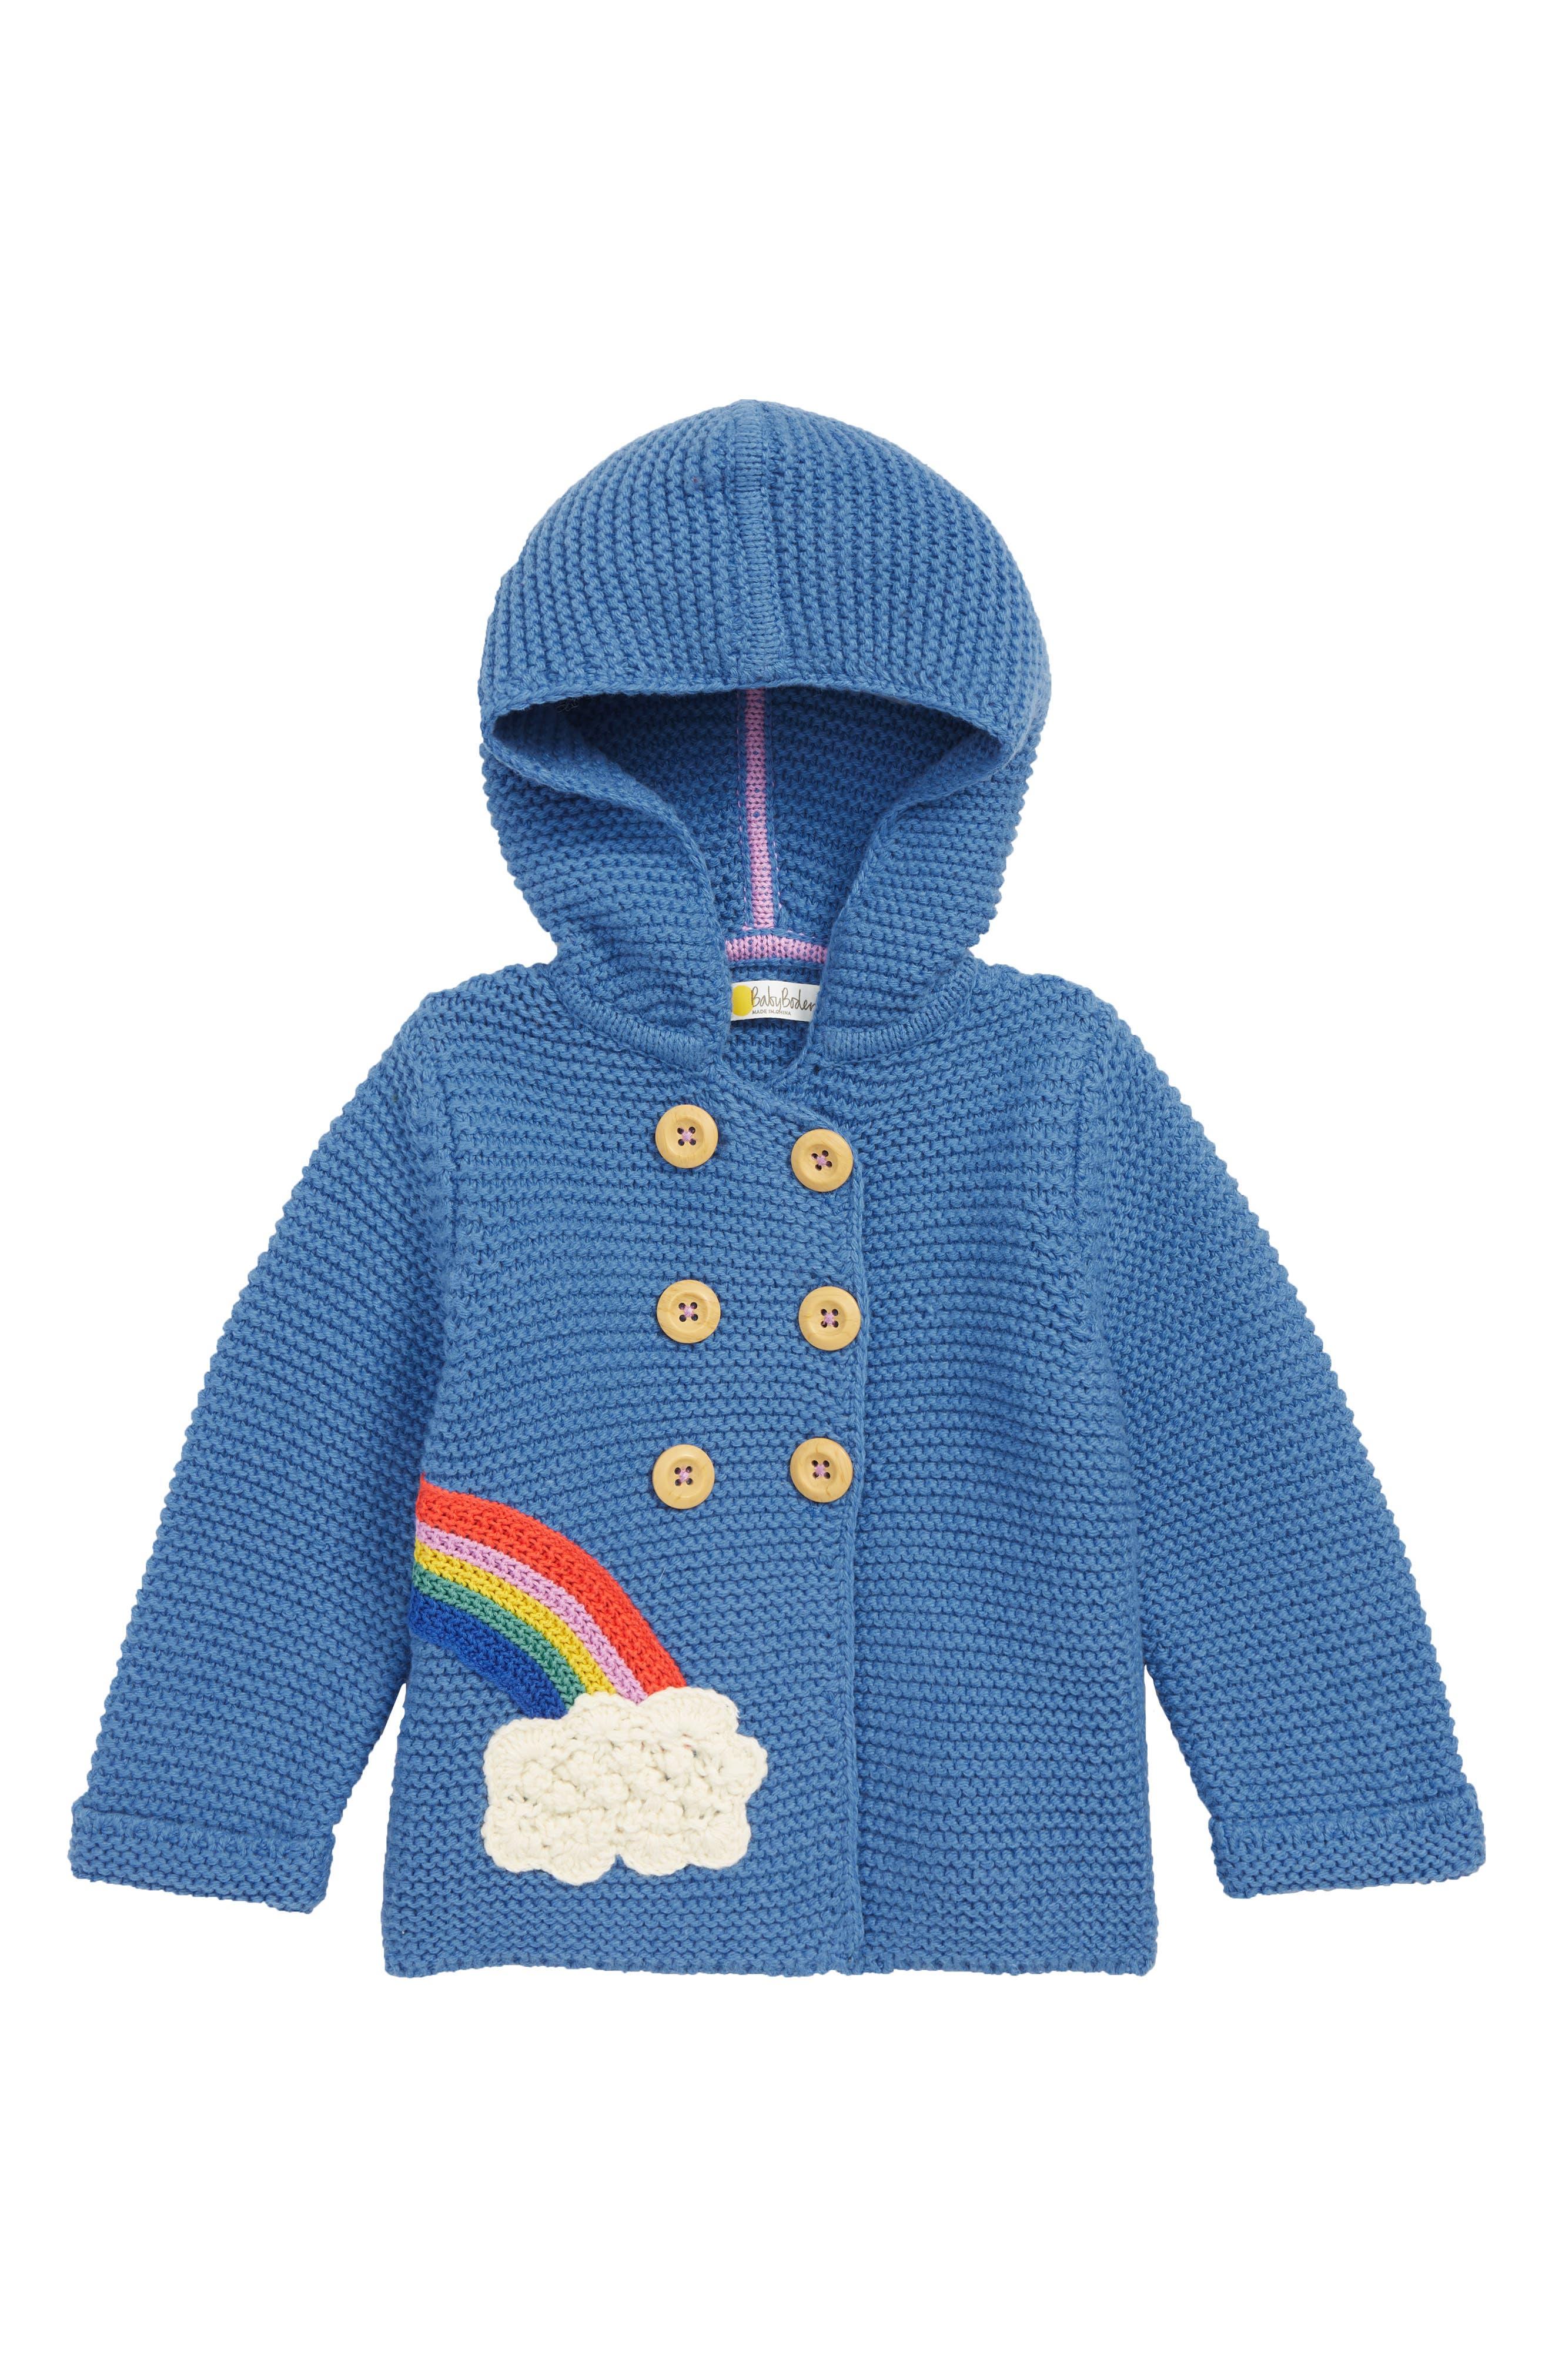 Infant Girls Mini Boden Knit Rainbow Jacket Size 36M  Blue